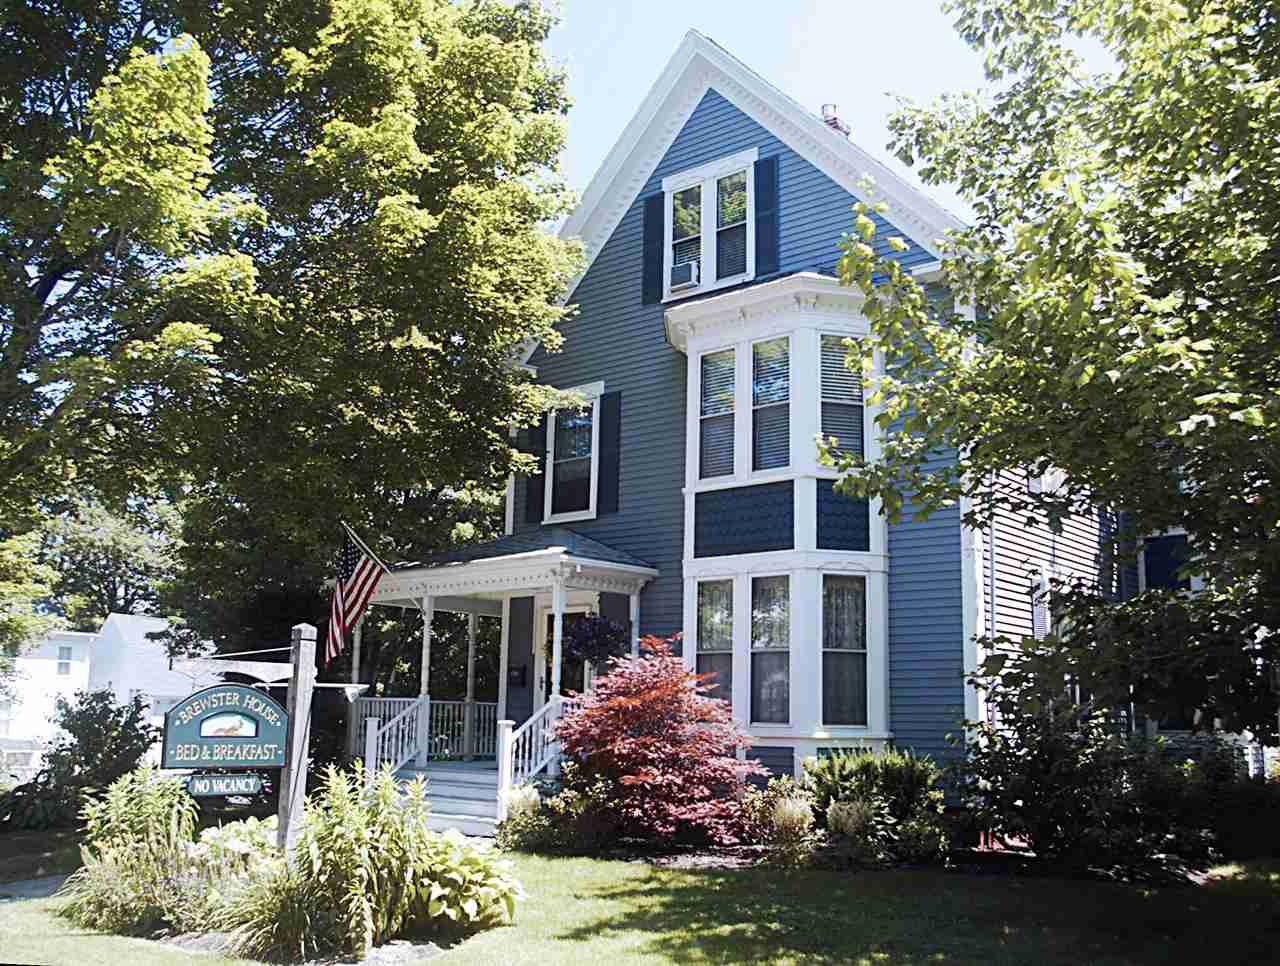 Brewster House Bed & Breakfast, Freeport, Maine. (Photo courtesy of Brewster House Bed & Breakfast)